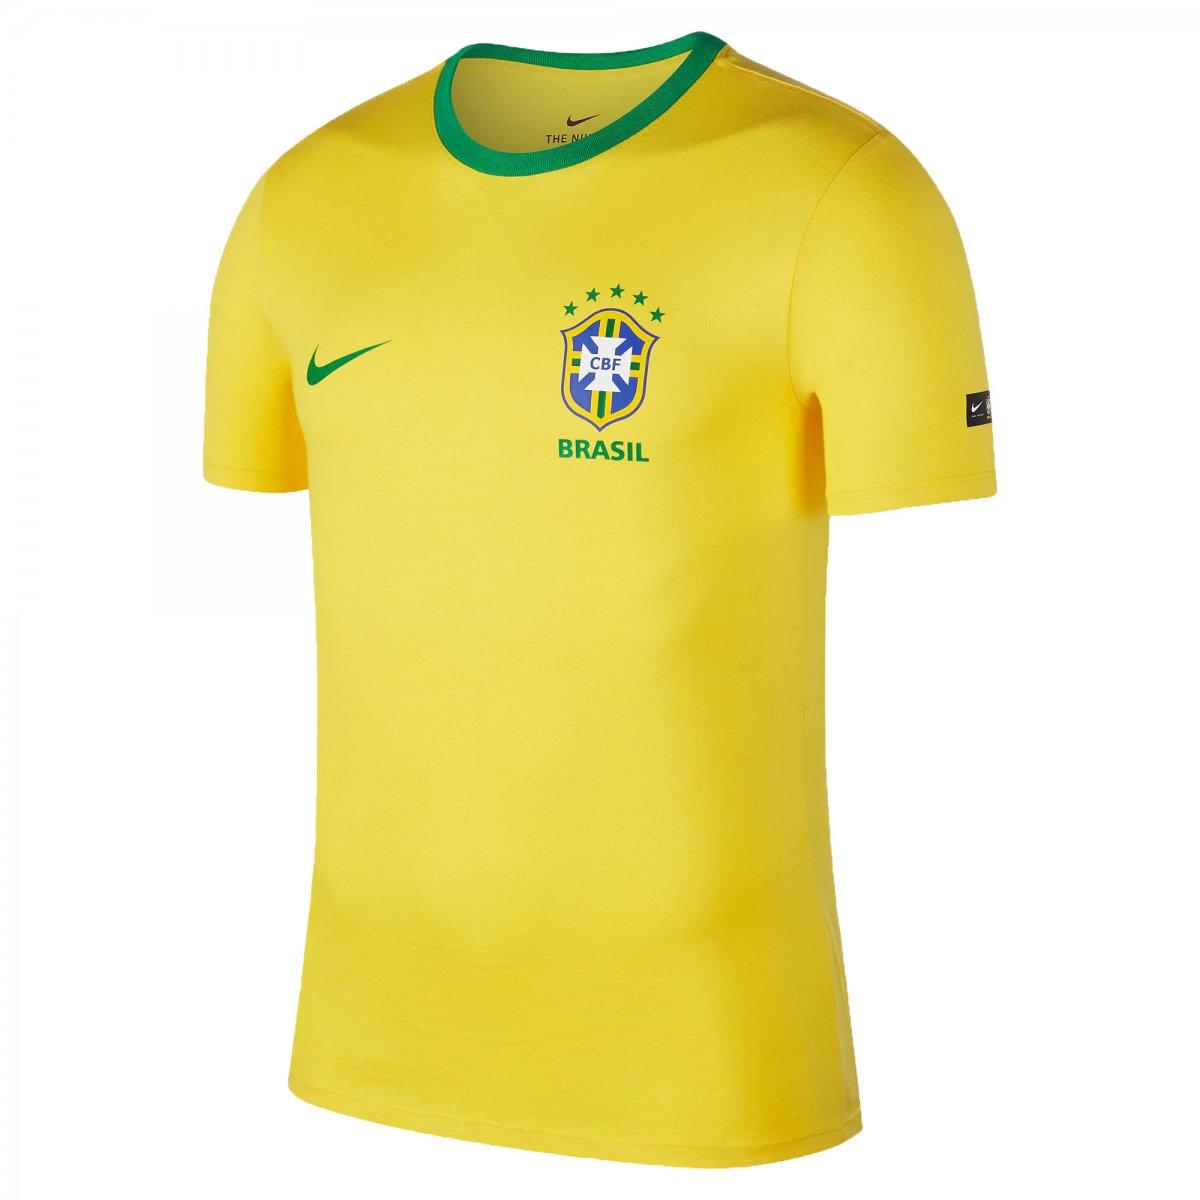 26ecc013dc6 Camisa Masculina Nike Brasil CBF Crest 2018 888320-749 - Amarelo ...